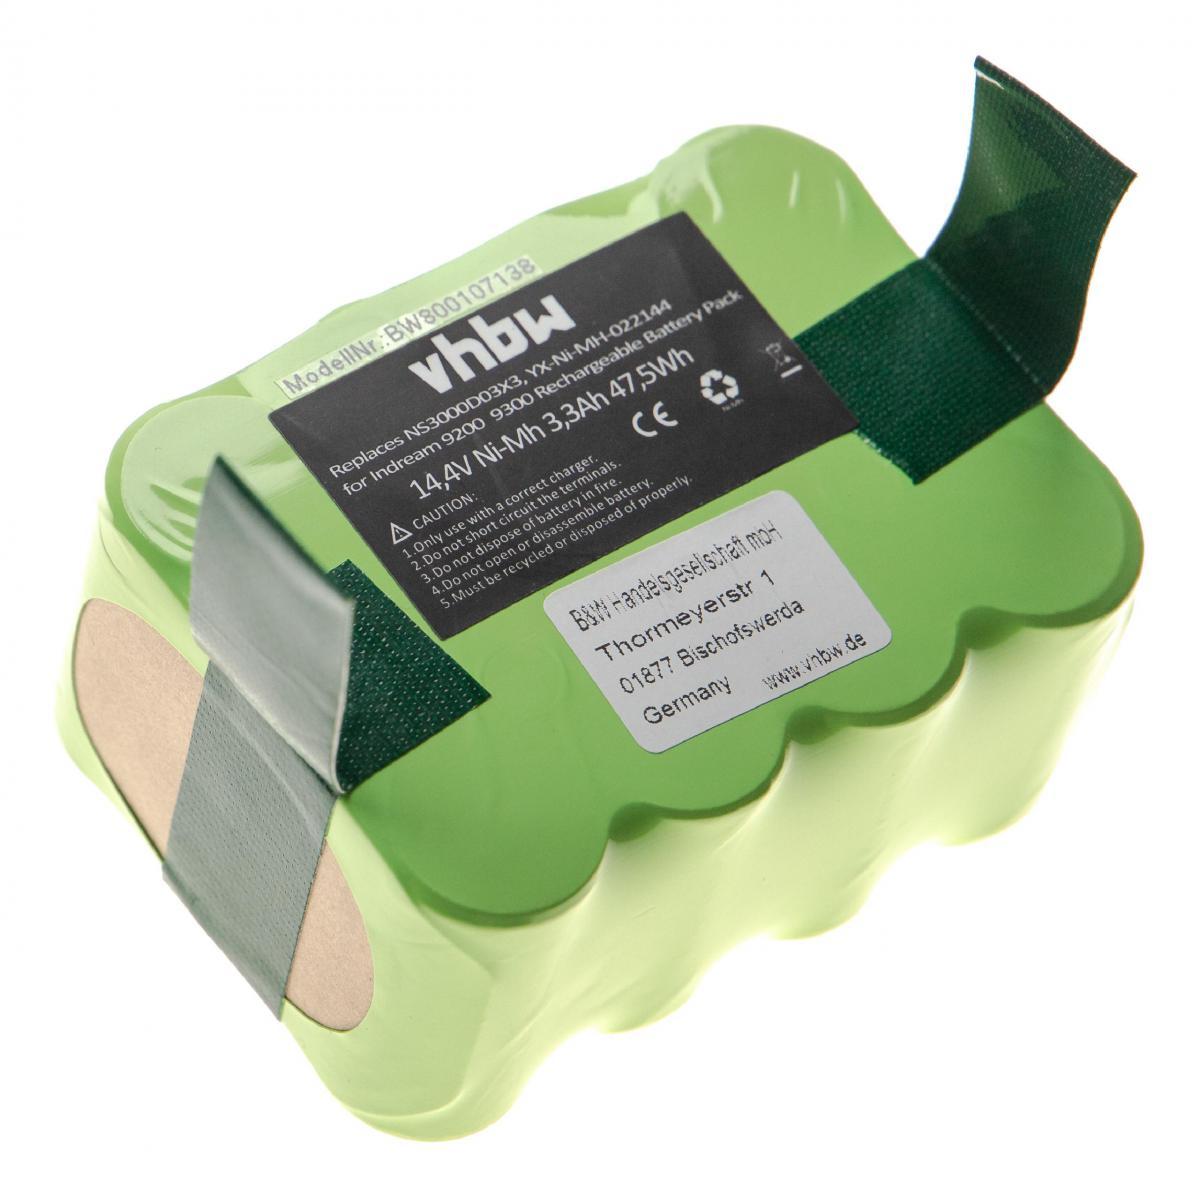 Vhbw Batterie Ni-MH vhbw 3300mAh (14.4V) compatible avec KV8 210C, 210XR, MyGenie XR210, Nestor E.Ziclean Furtiv remplace : N